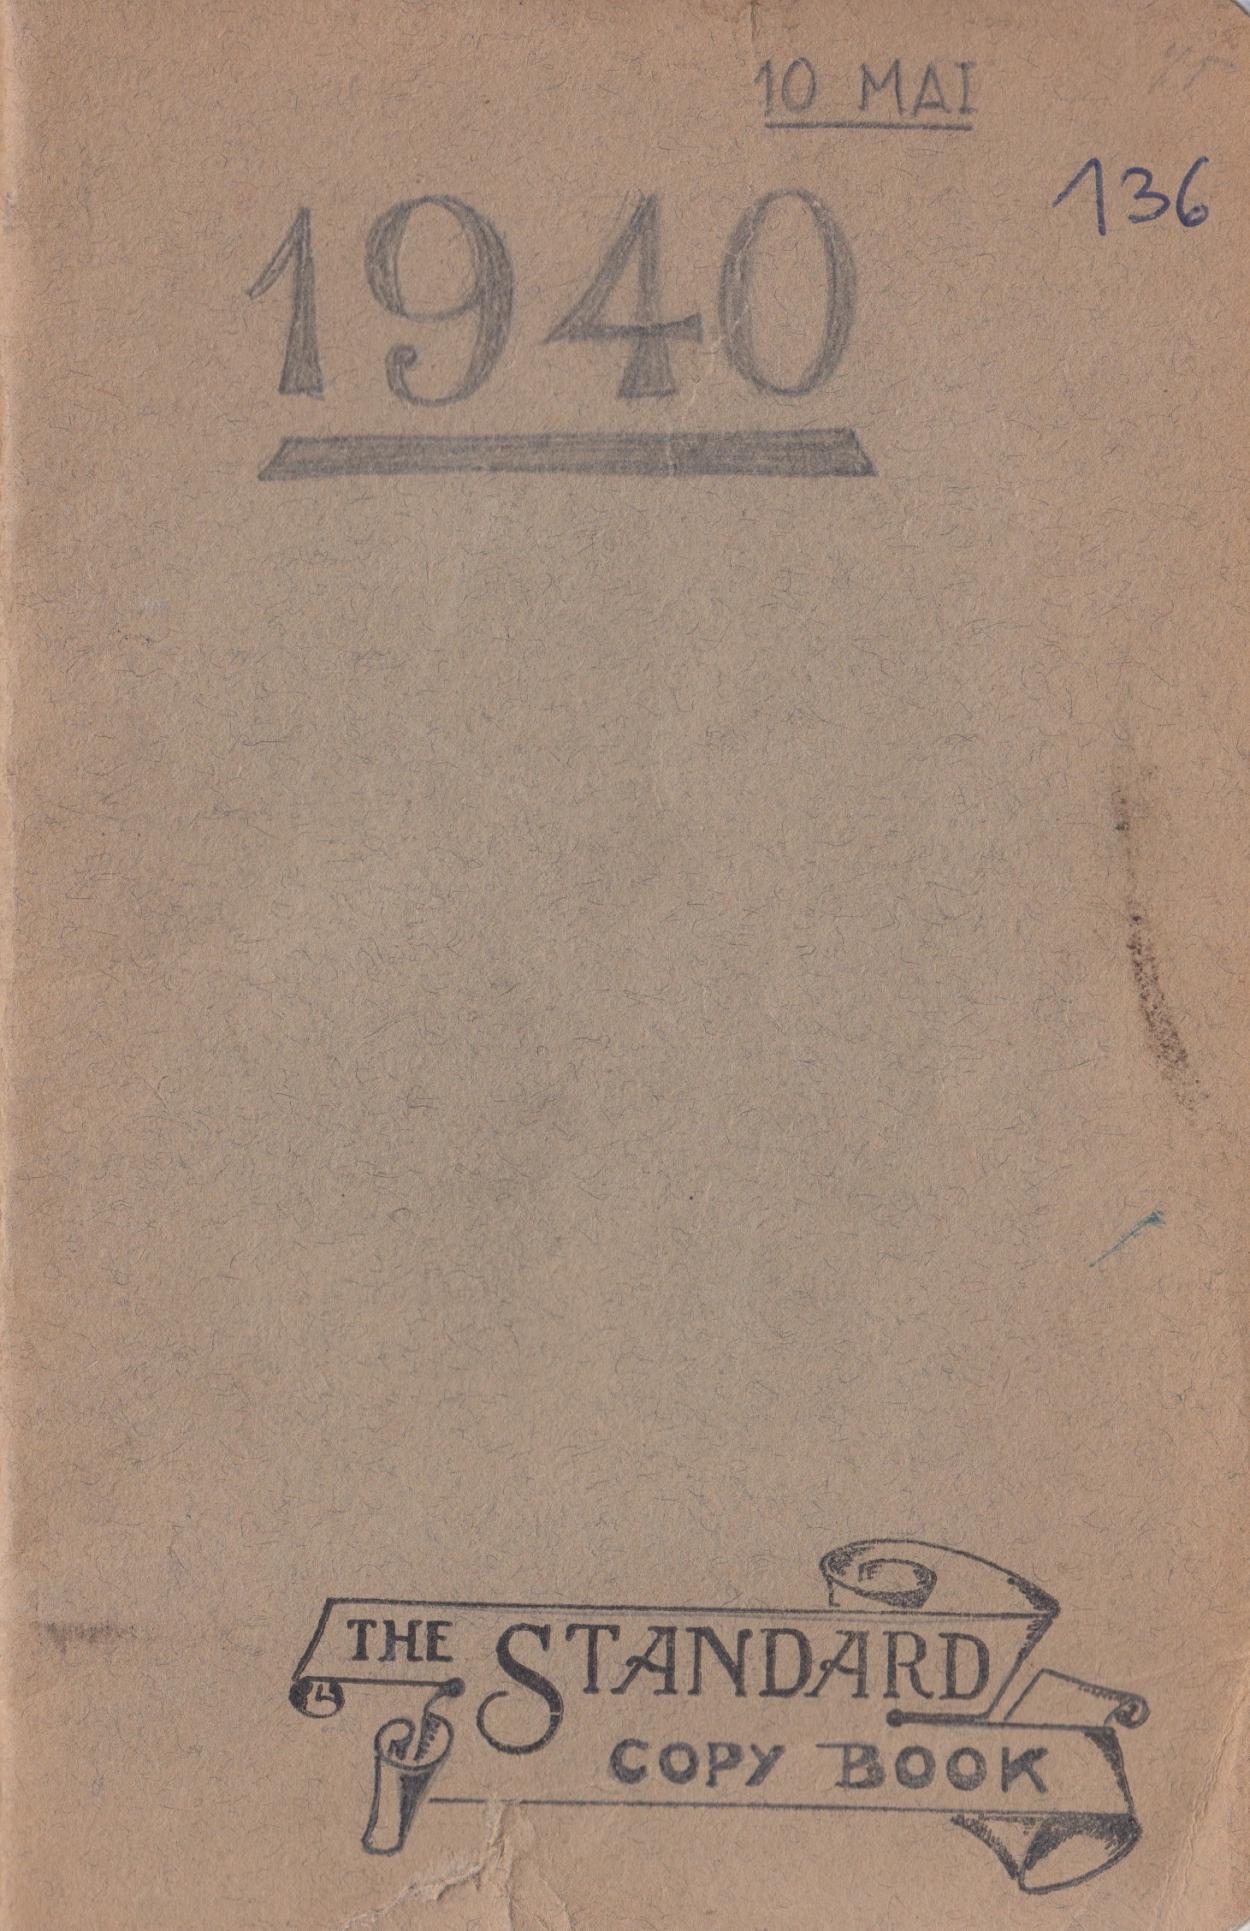 belvirmus_FRANCOIS BERDONDINI_journal intime 1940 1